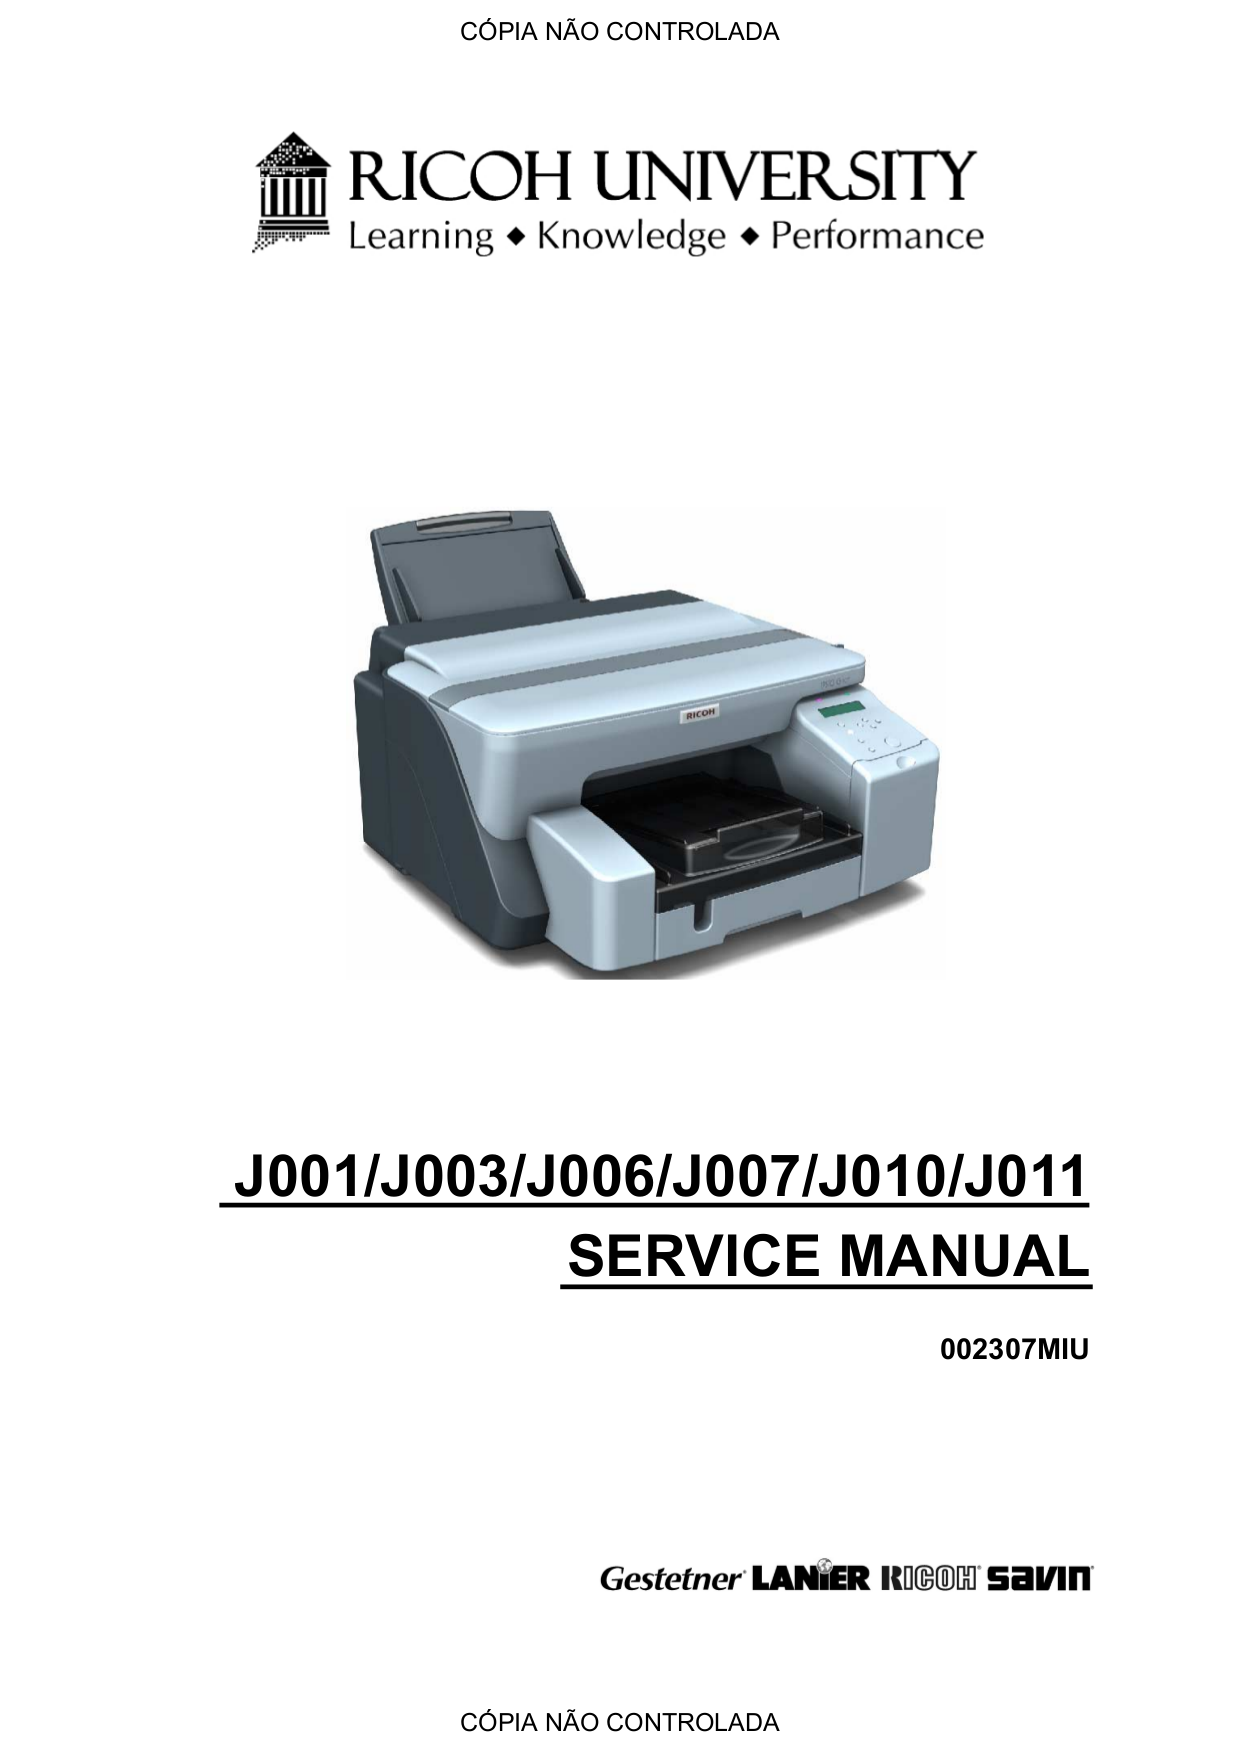 ricoh cl7200 service manual pdf rh ricoh cl7200 service manual pdf tempower us